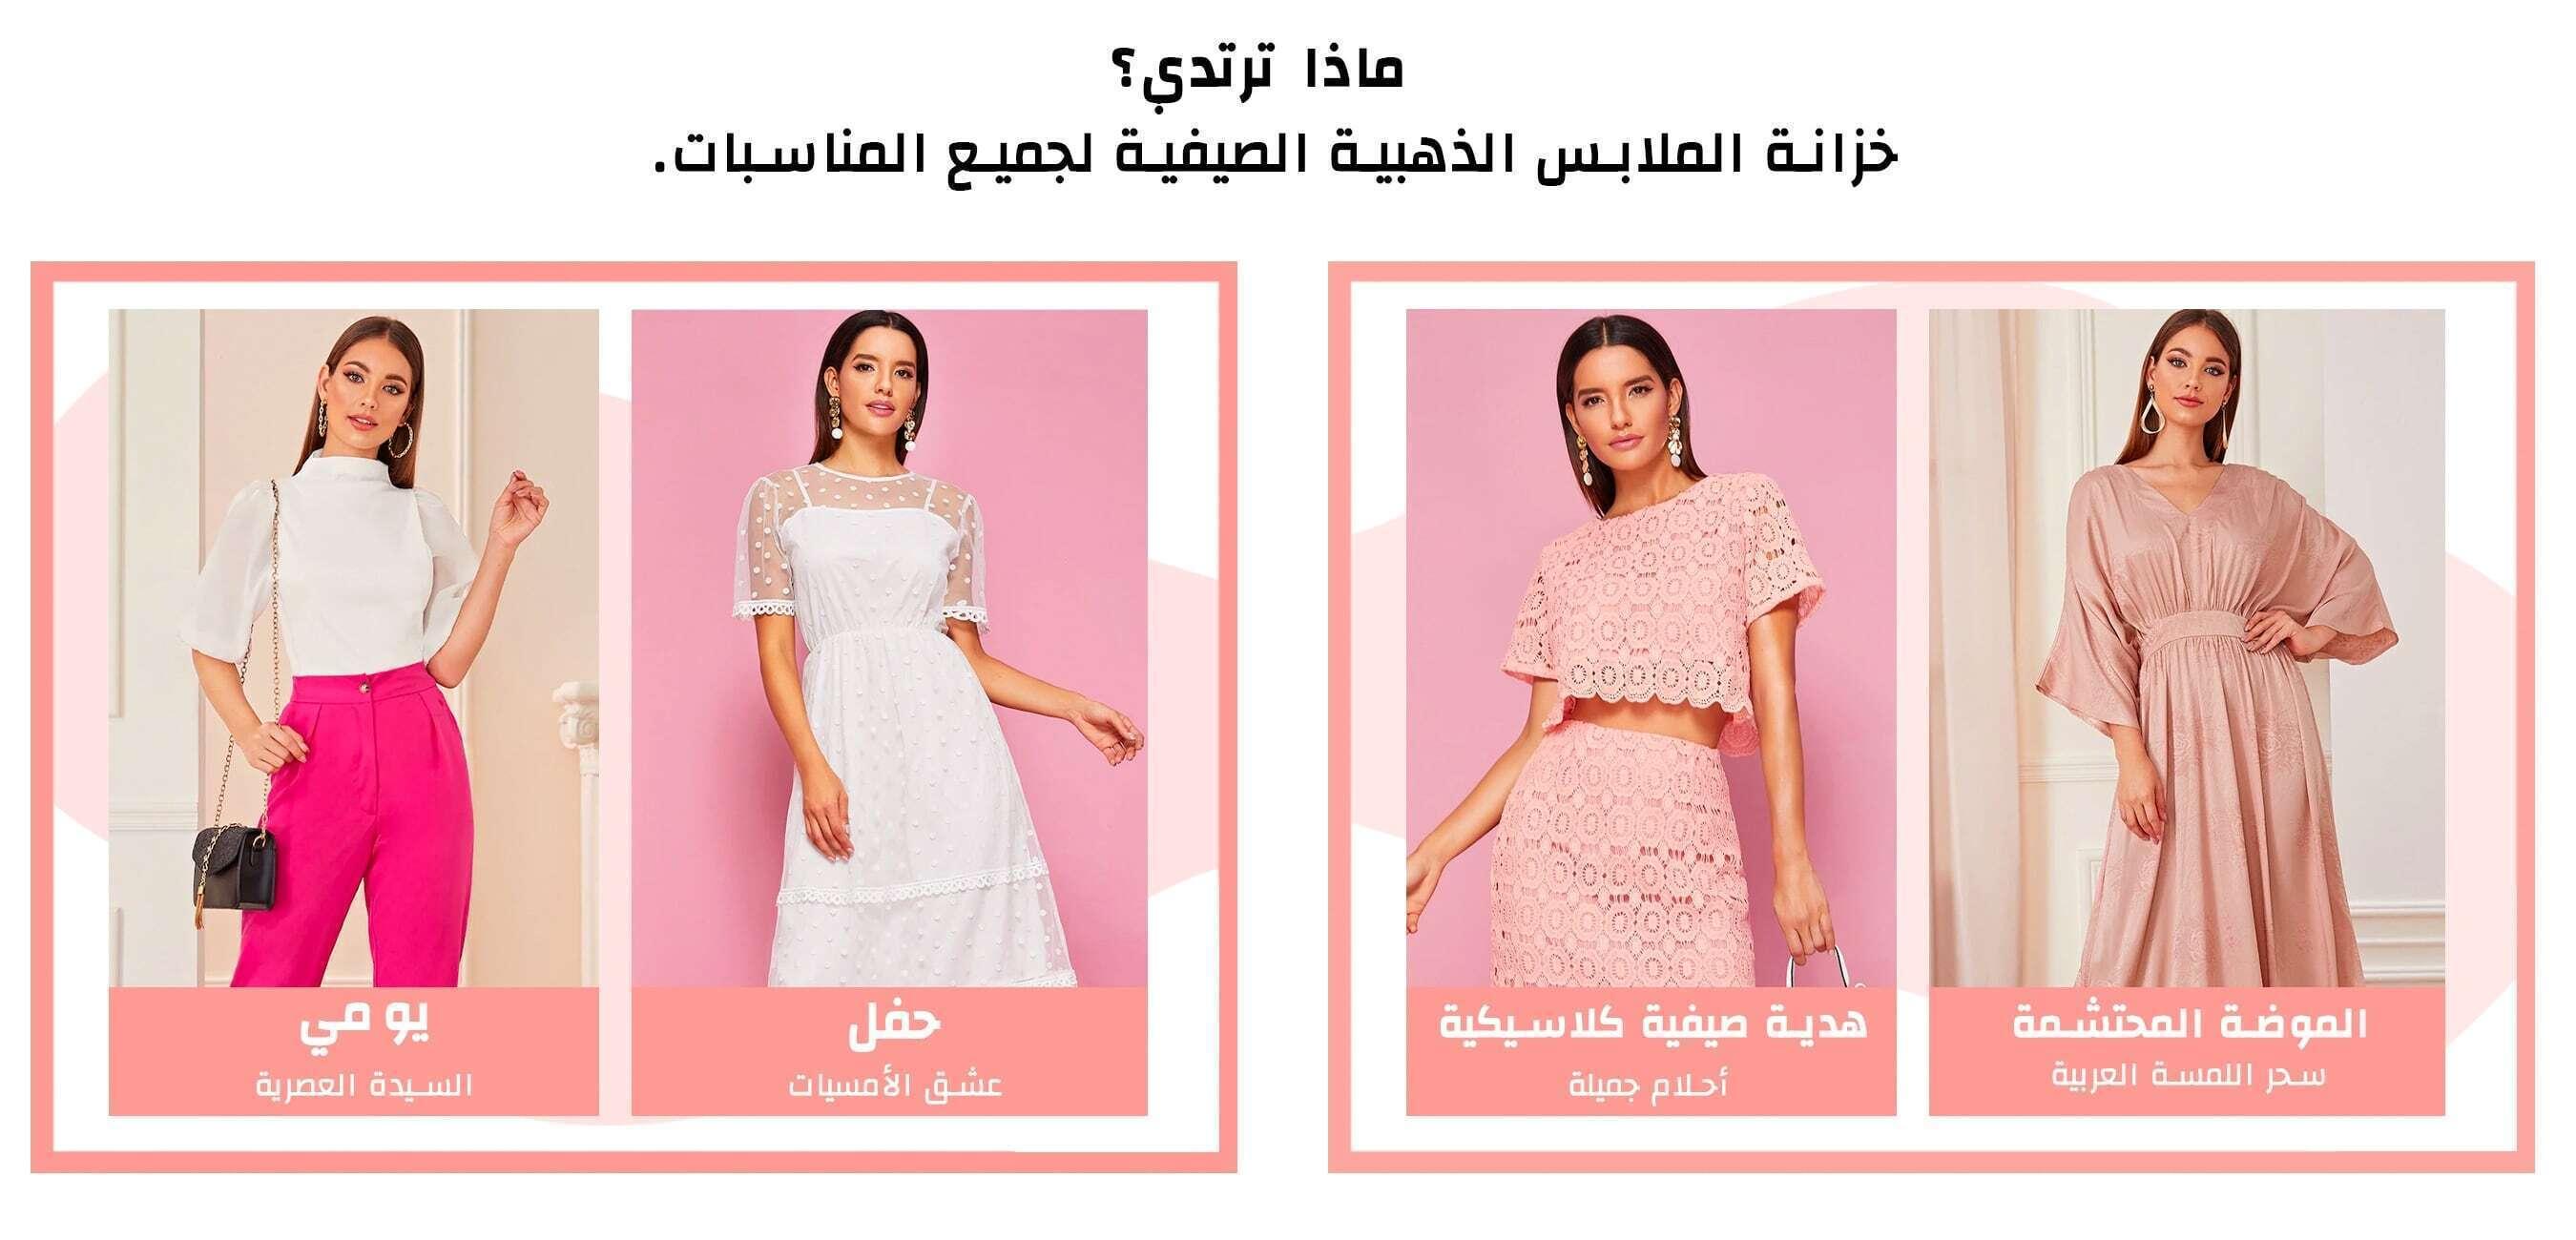 ff4499d62 شي إن | موضة نساء على الإنترنت | تسوقوا الفساتين، والأحذية والحقائب